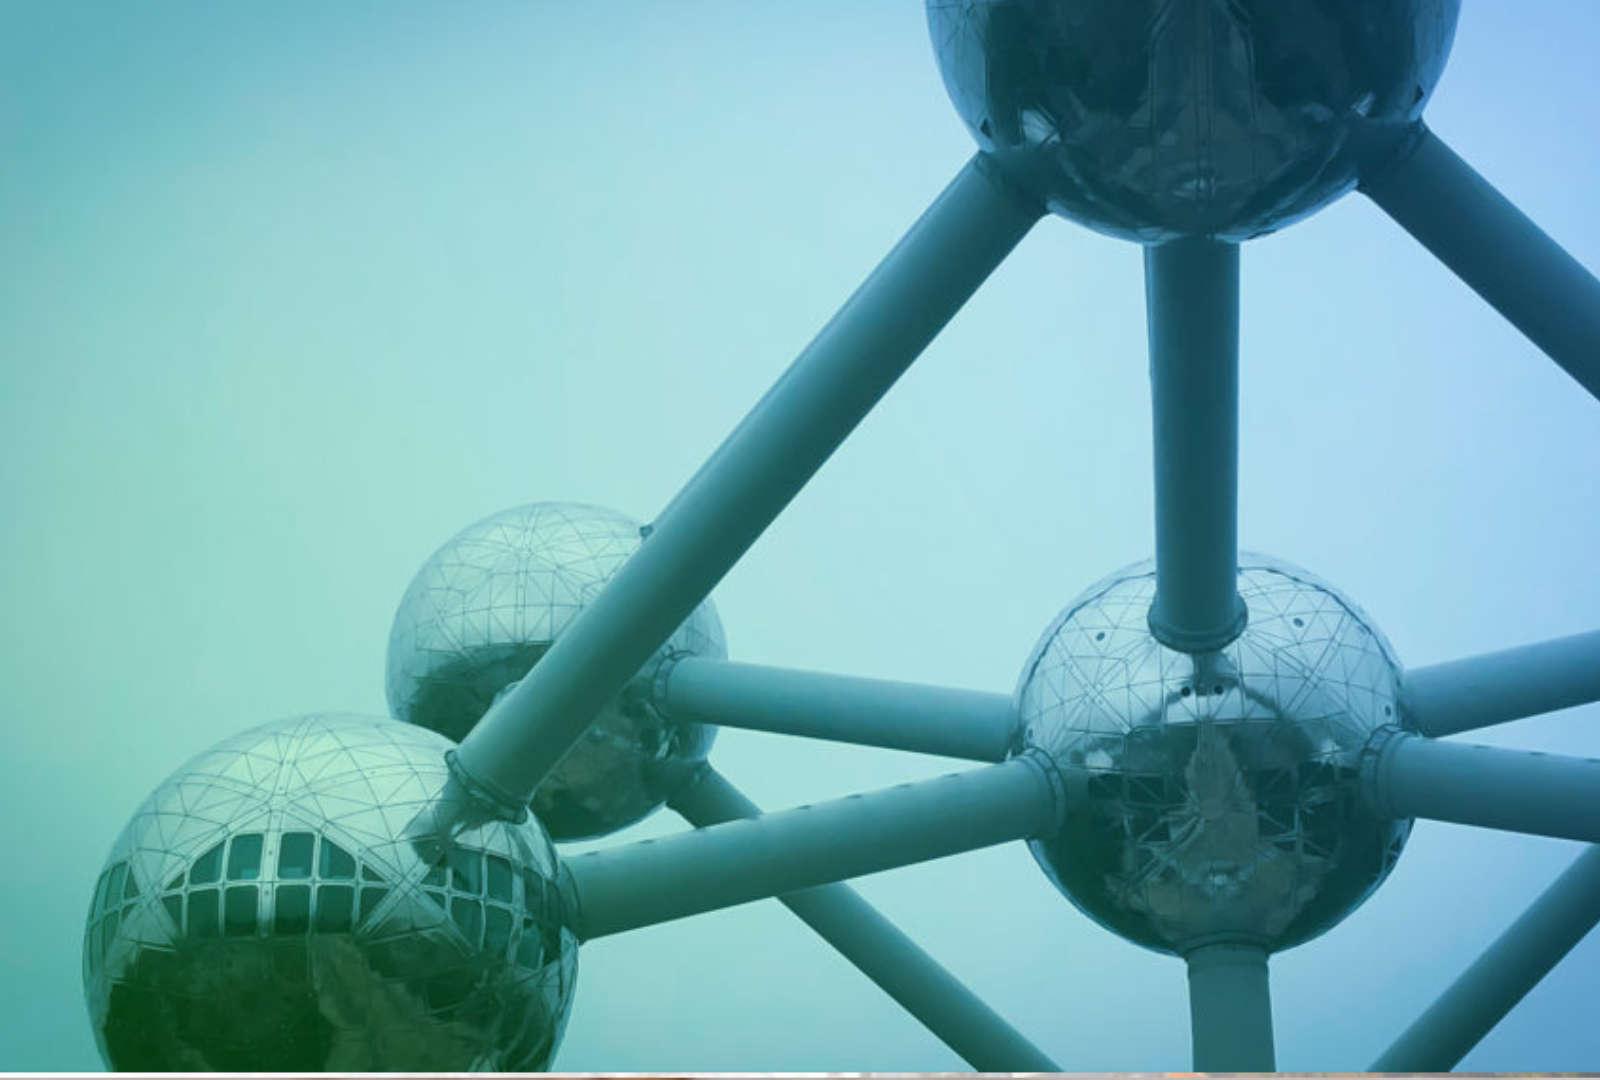 DIGITA, VEOWARE SPACE, CITIZENLAB Innovative Starters Award, 3 lauréats se partagent 1 500 000 euros